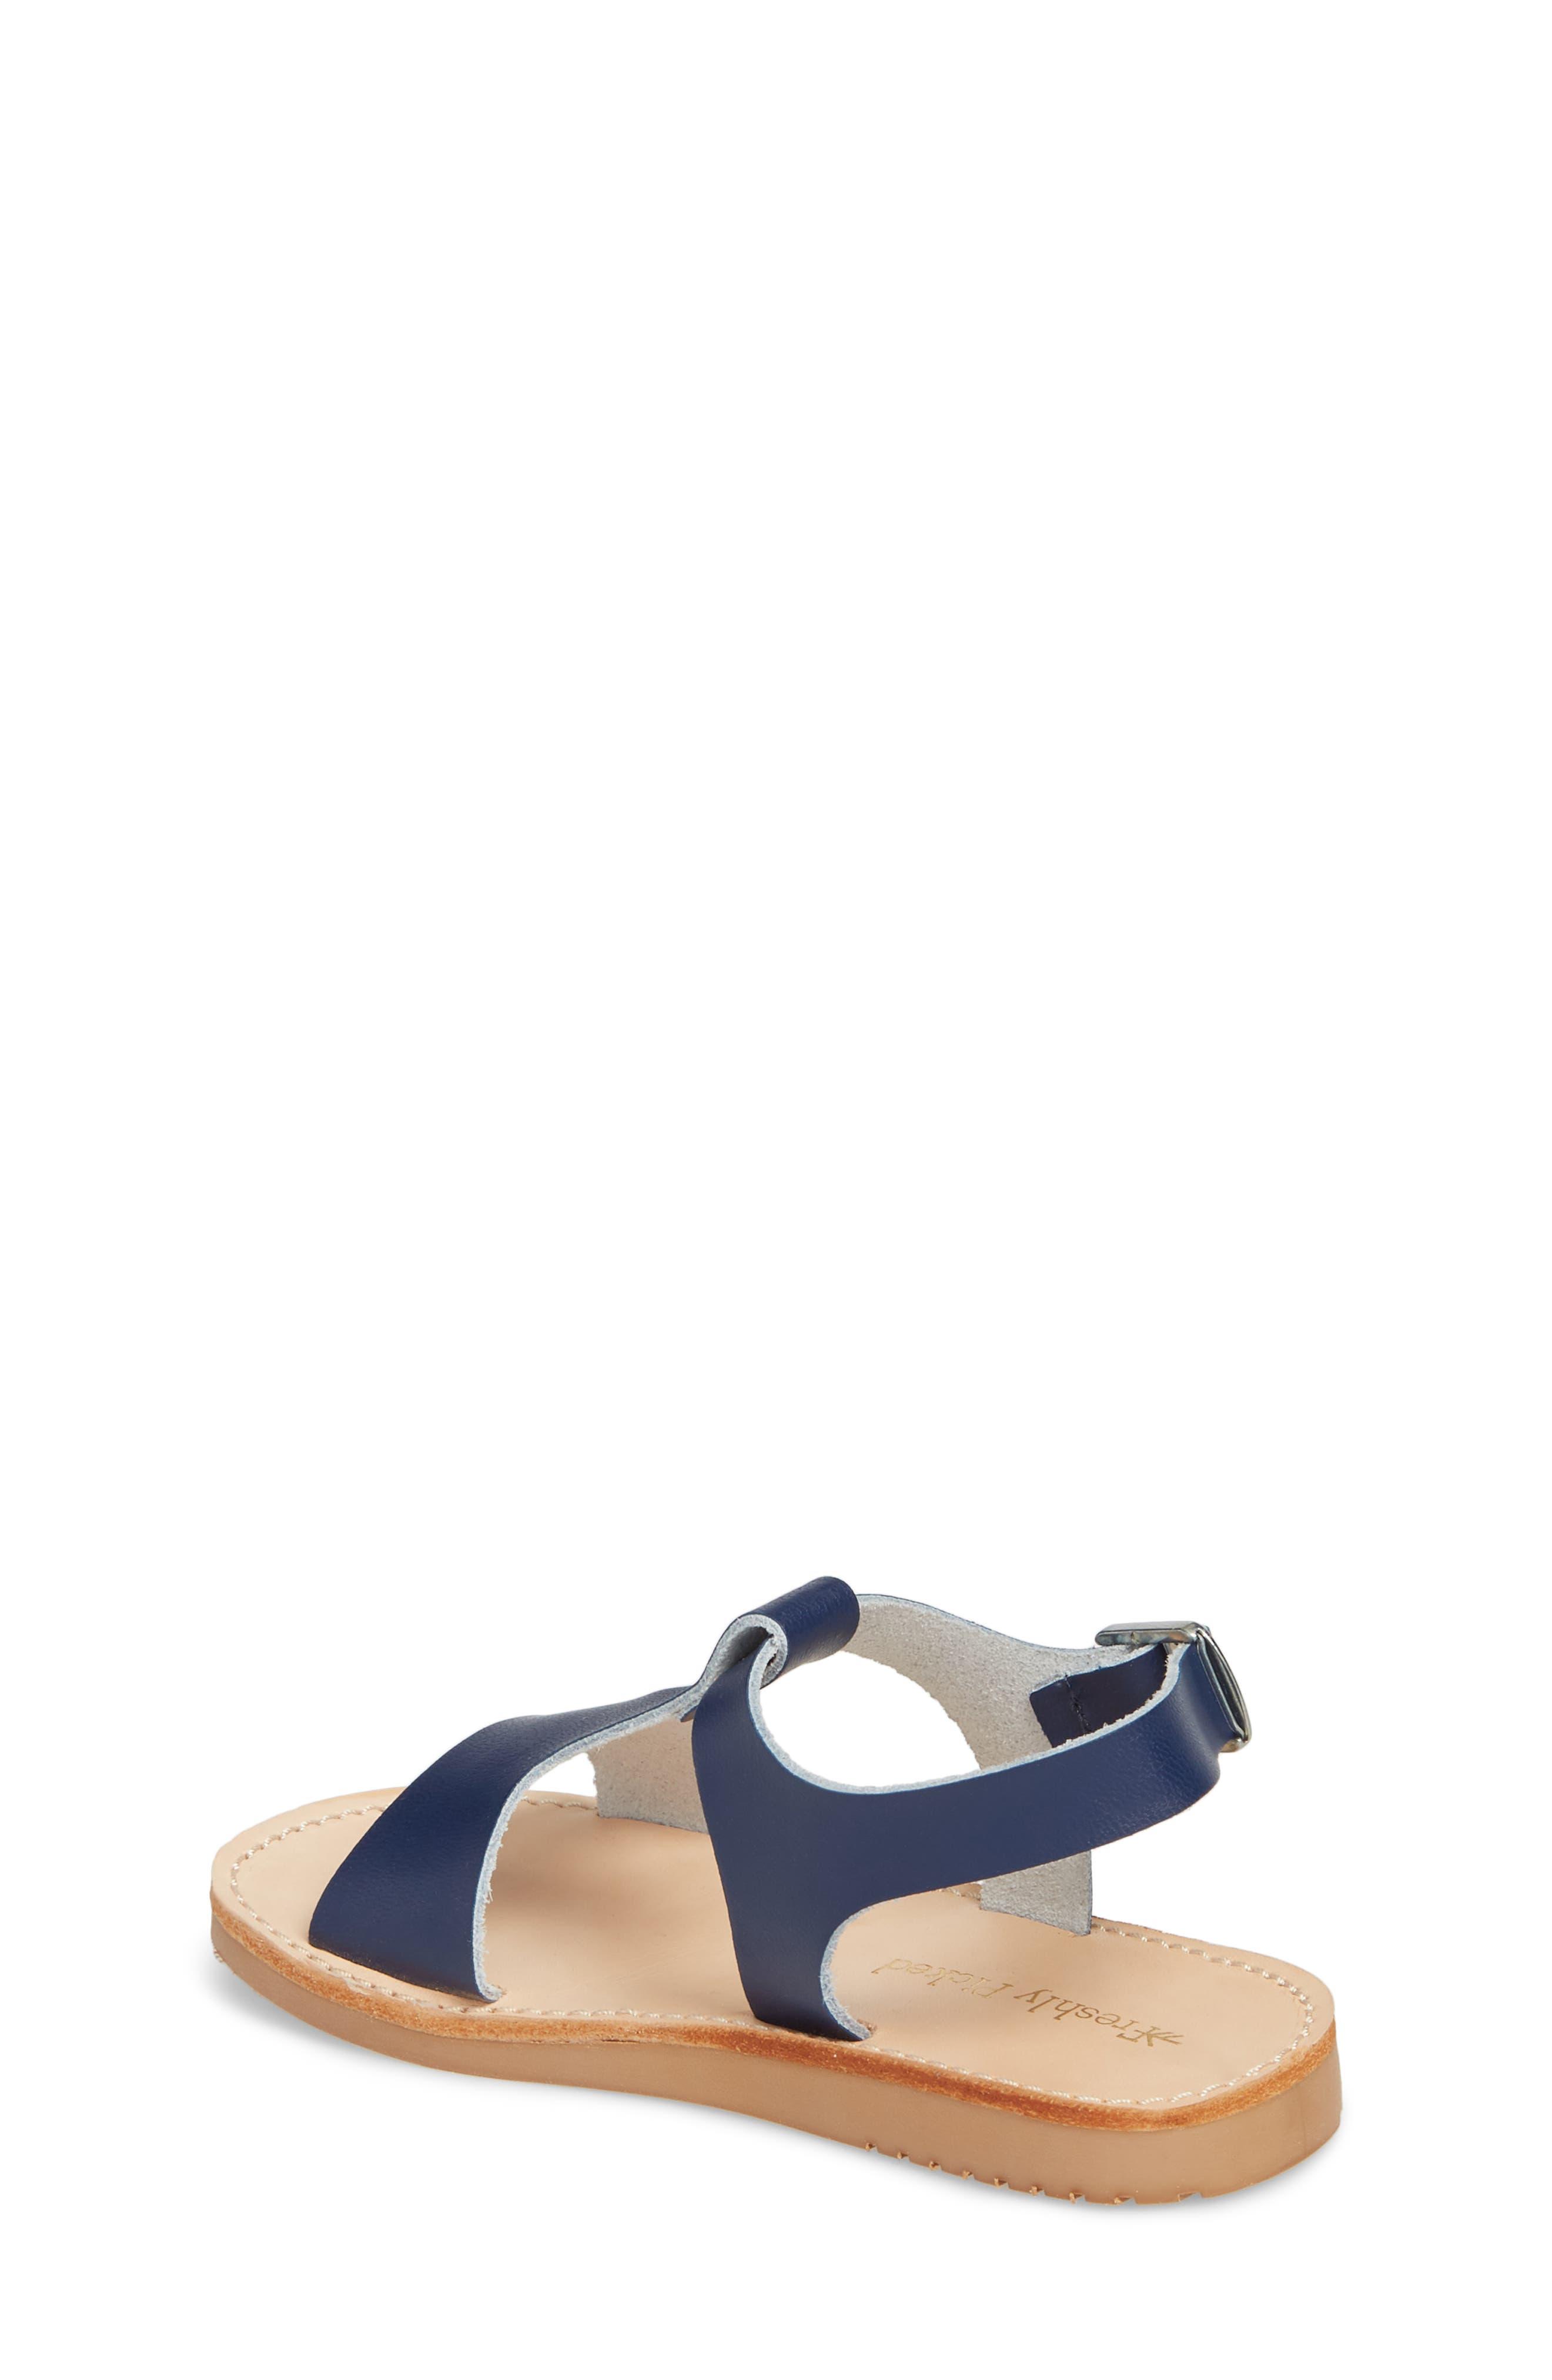 Malibu Water Resistant Sandal,                             Alternate thumbnail 2, color,                             Navy